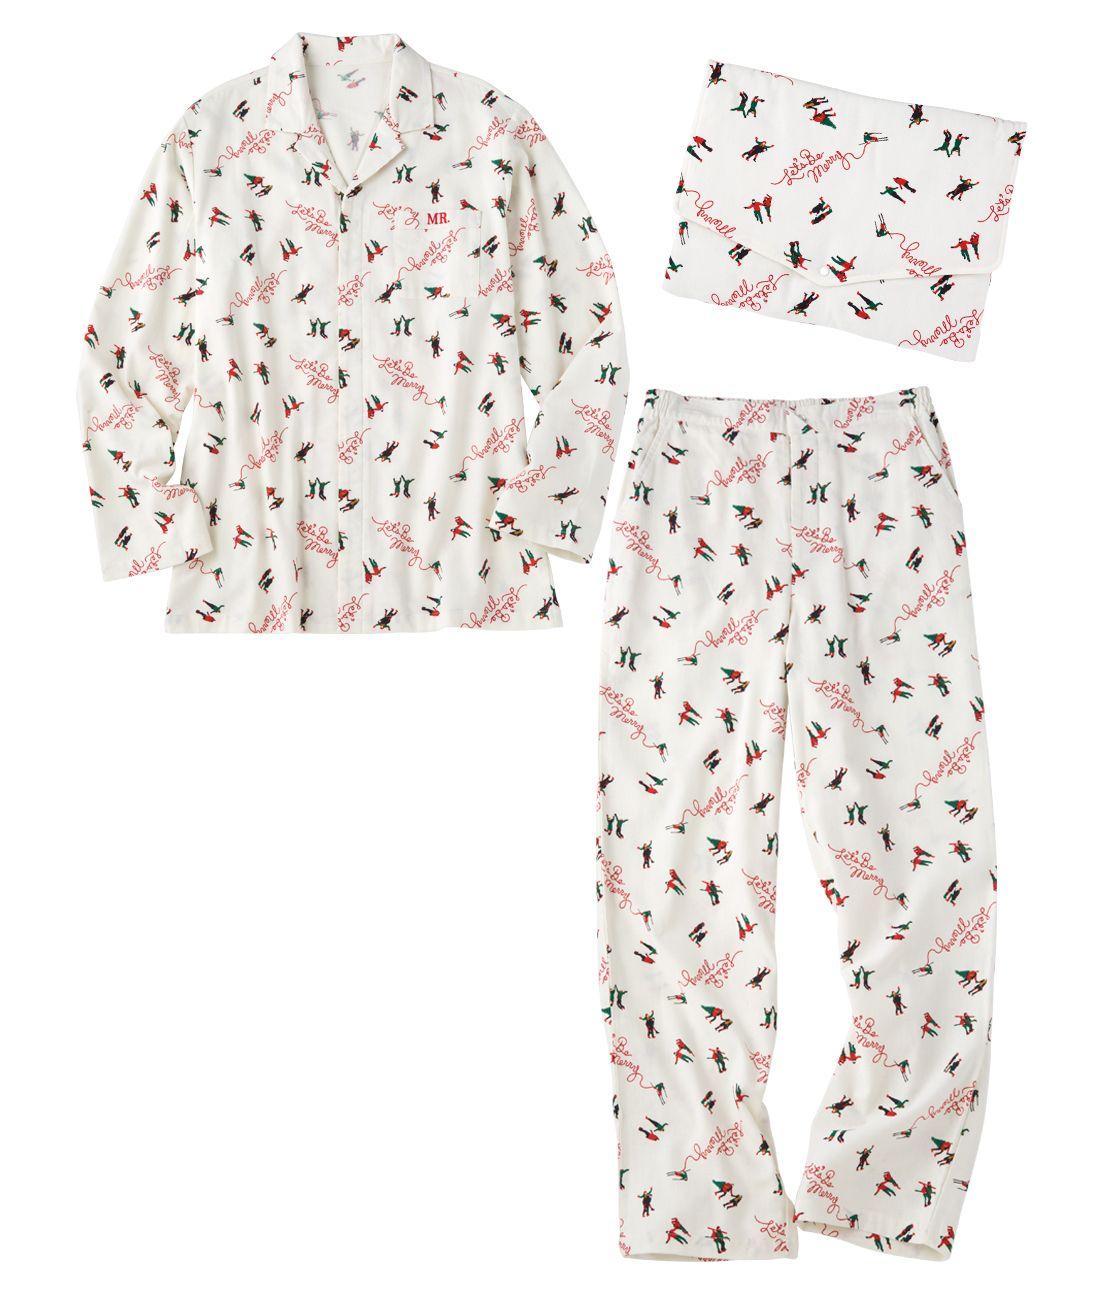 Men's warm cotton shirt pajamas set